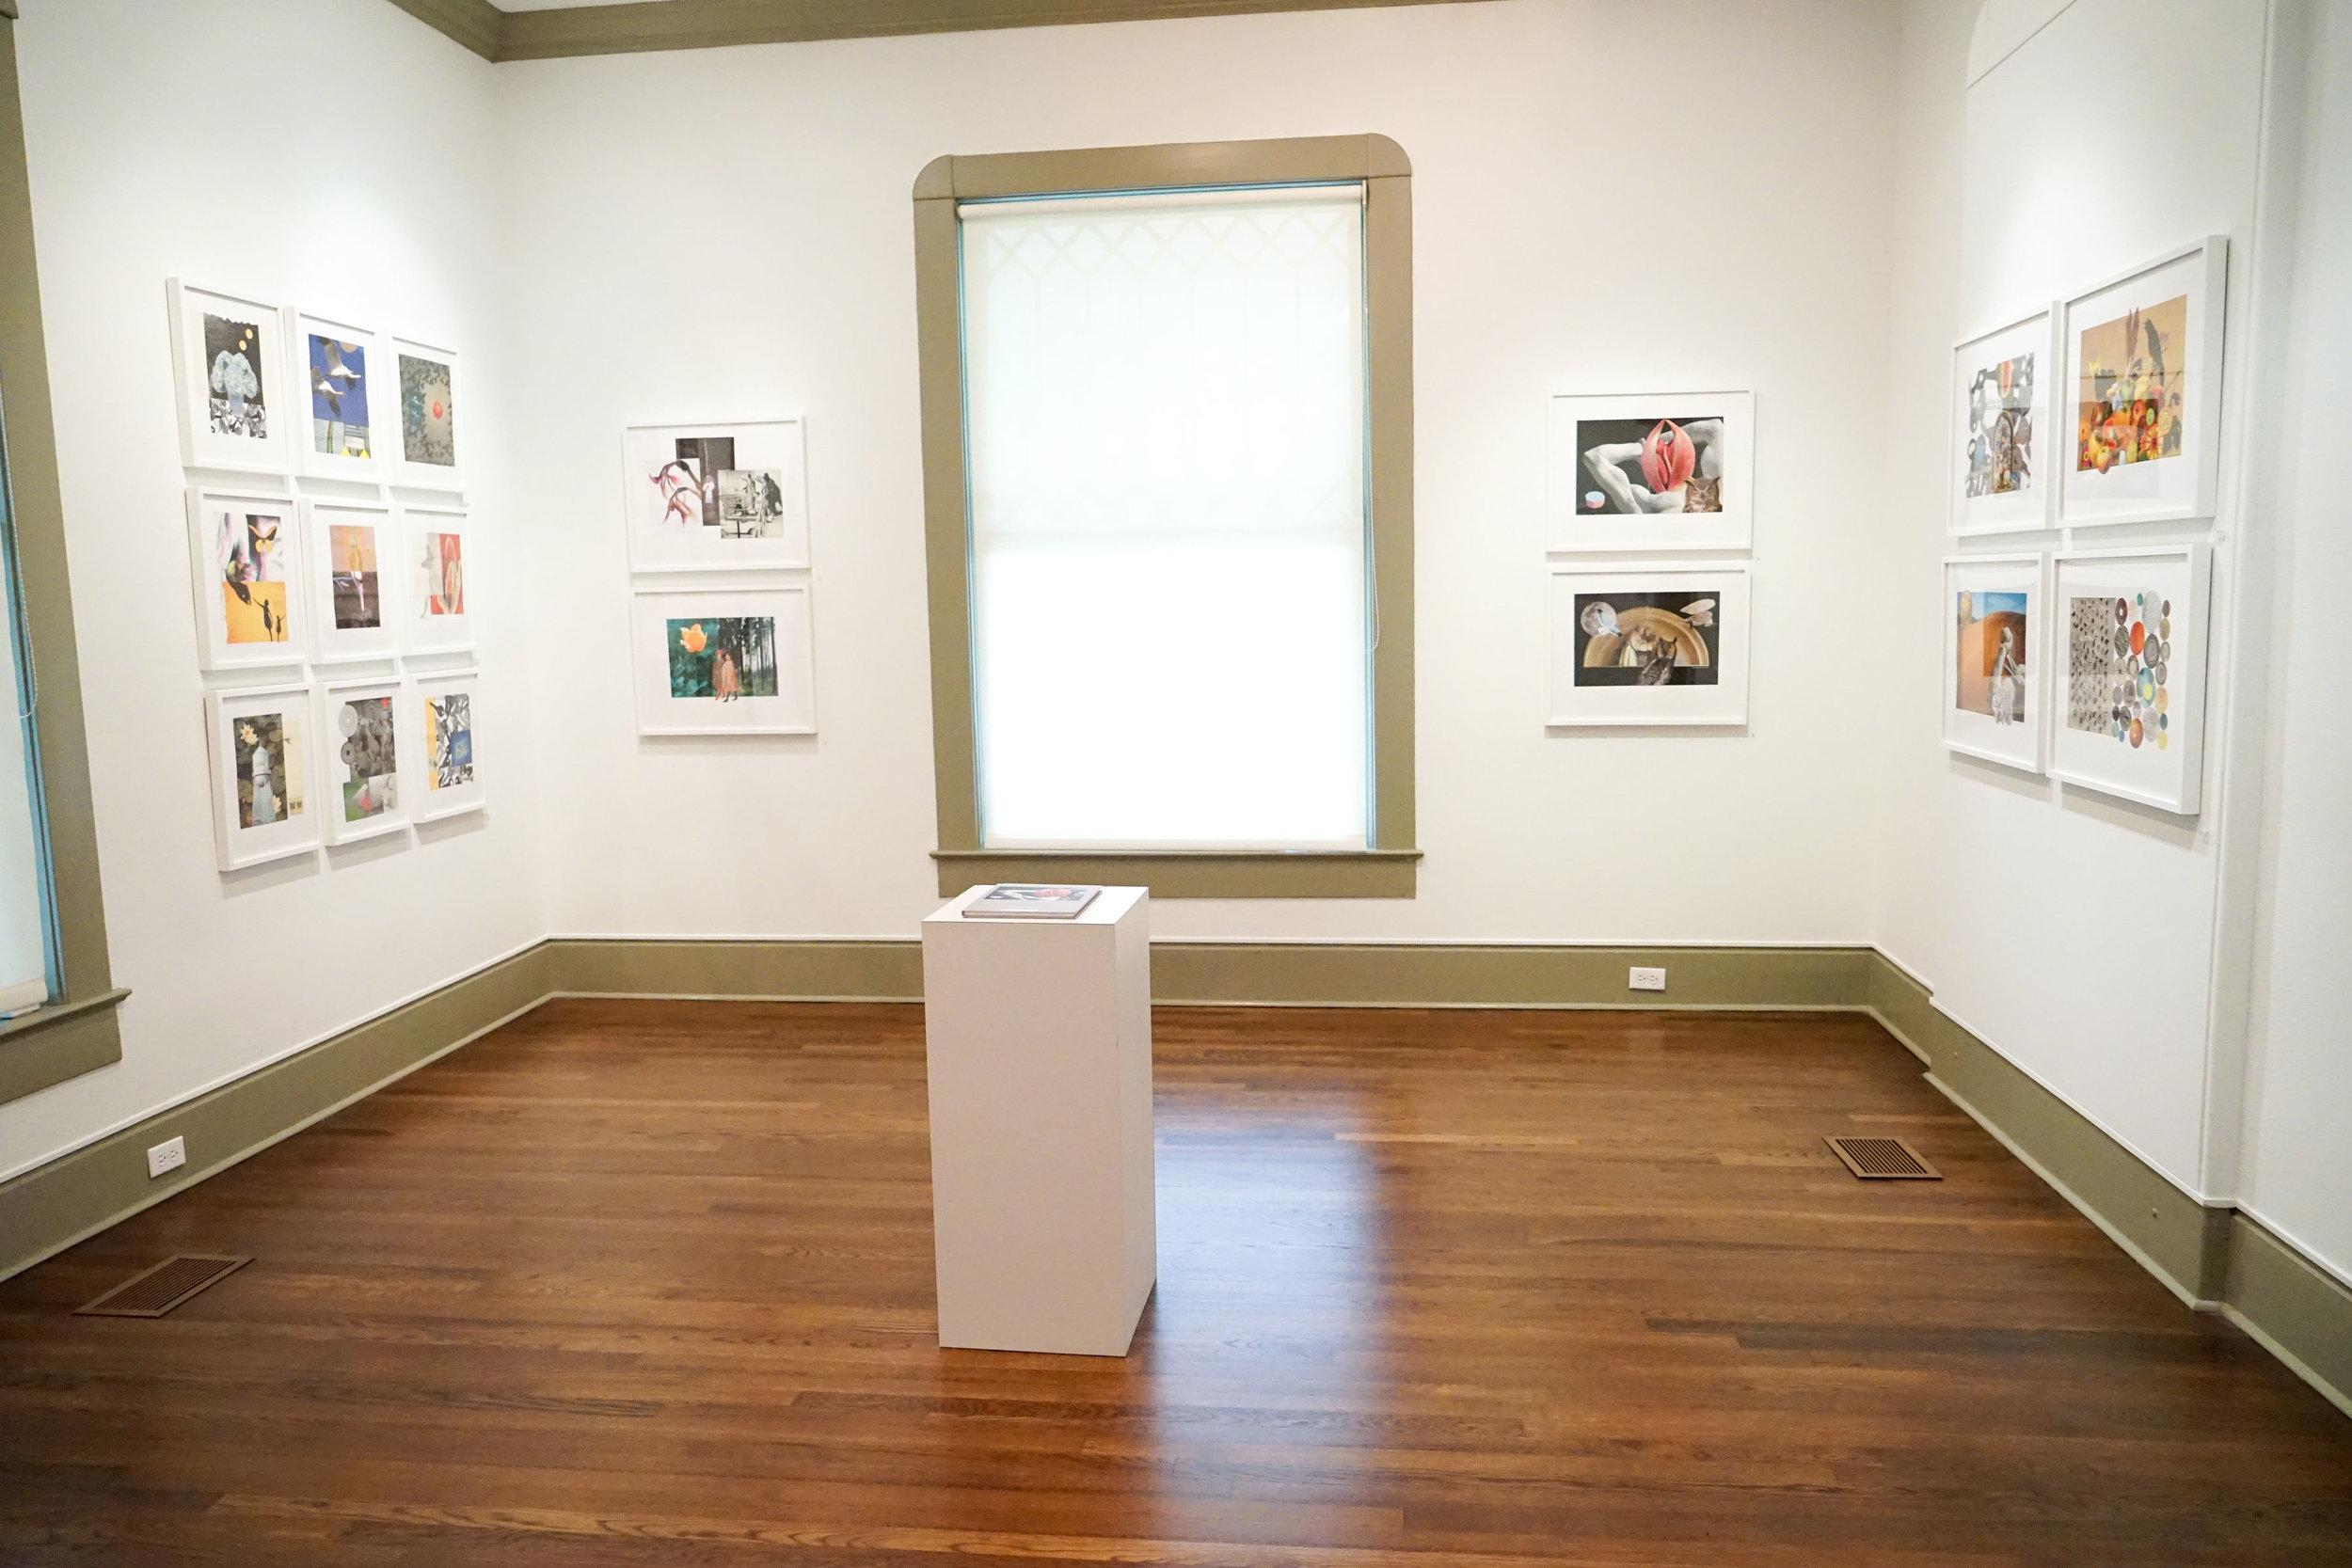 Beeville Art Museum installation, 2018